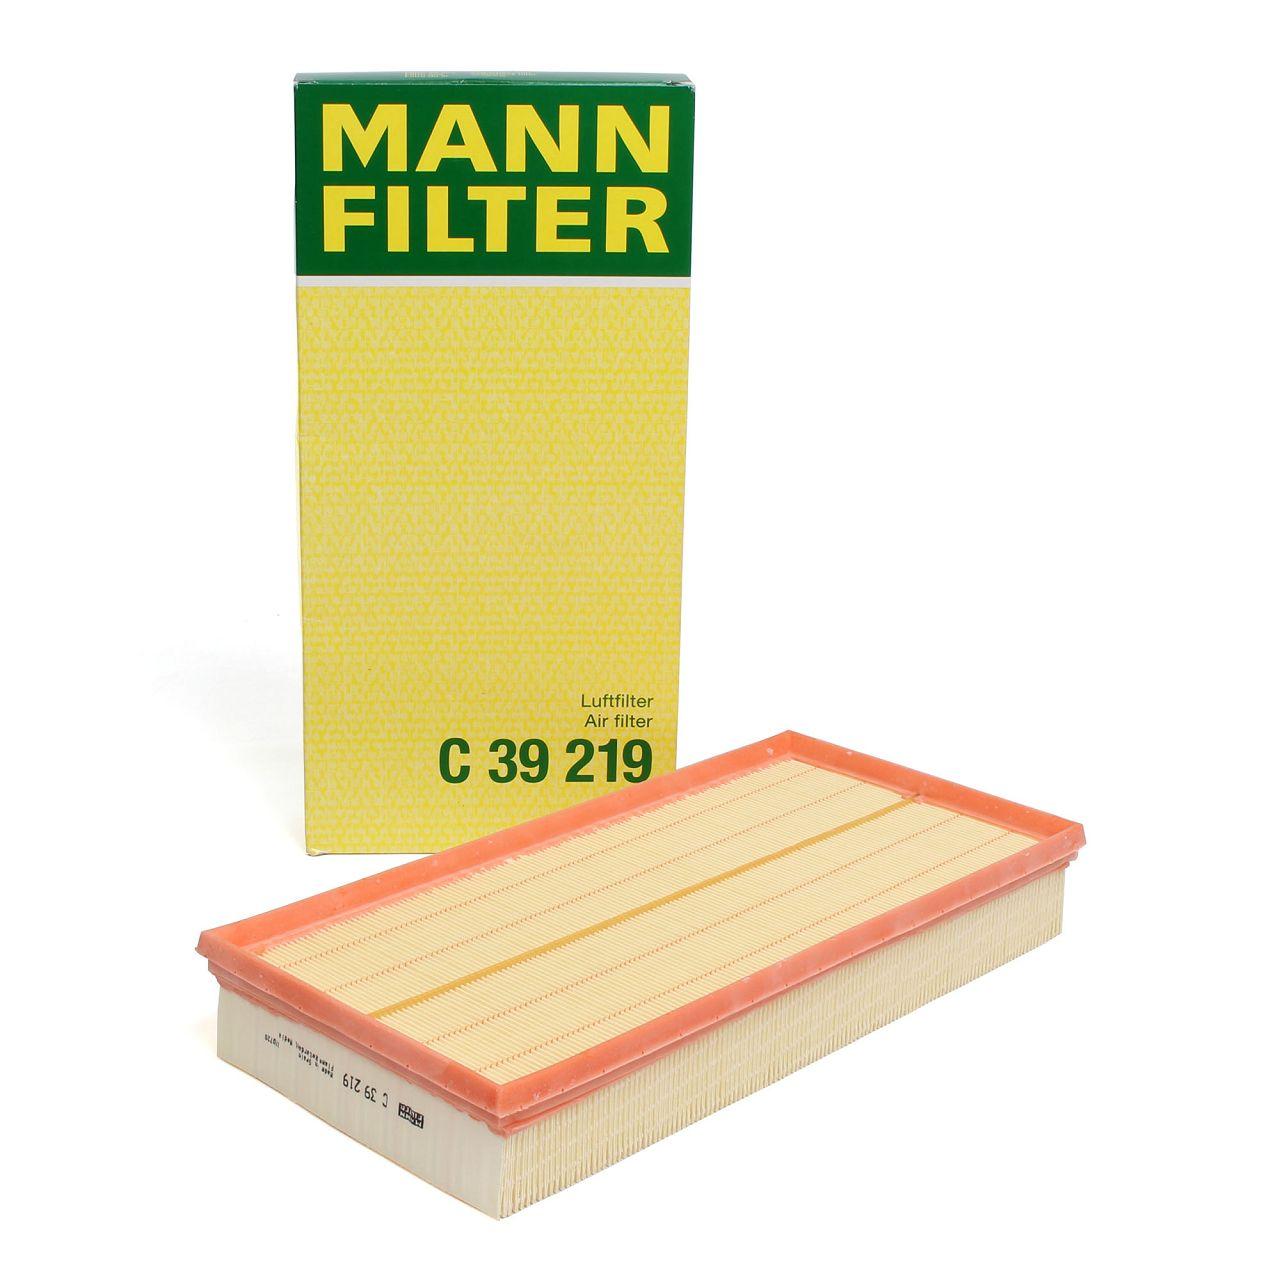 MANN Luftfilter C39219 für AUDI Q7 4L PORSCHE CAYENNE 9PA 92A VW TOUAREG 7L 7P